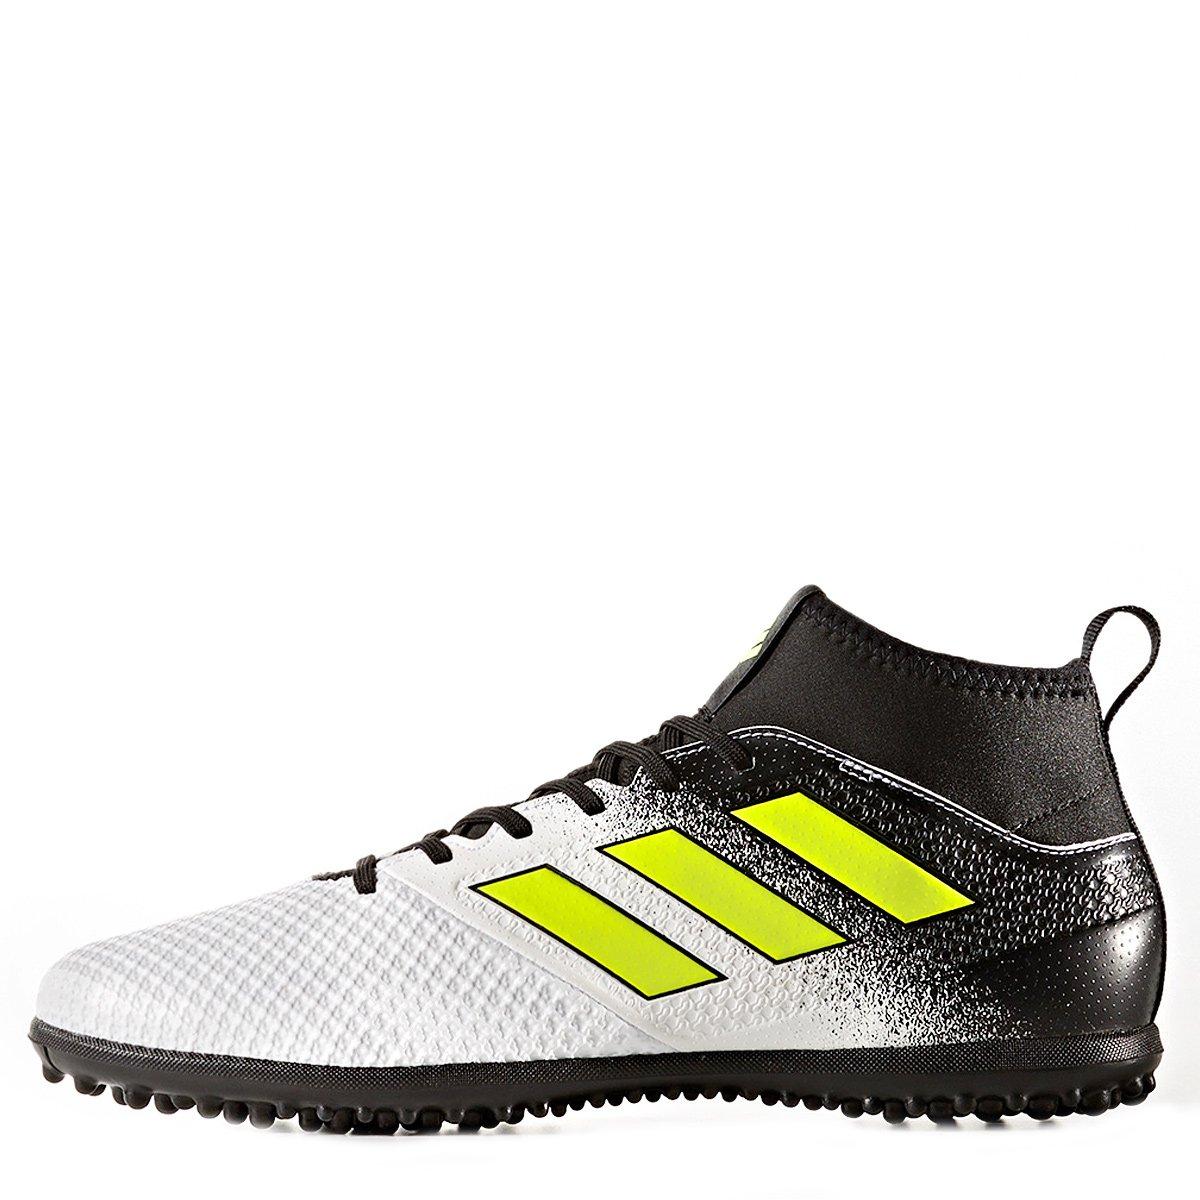 66933fd578c73 FornecedorNetshoes. Chuteira Society Adidas Ace 17.3 TF